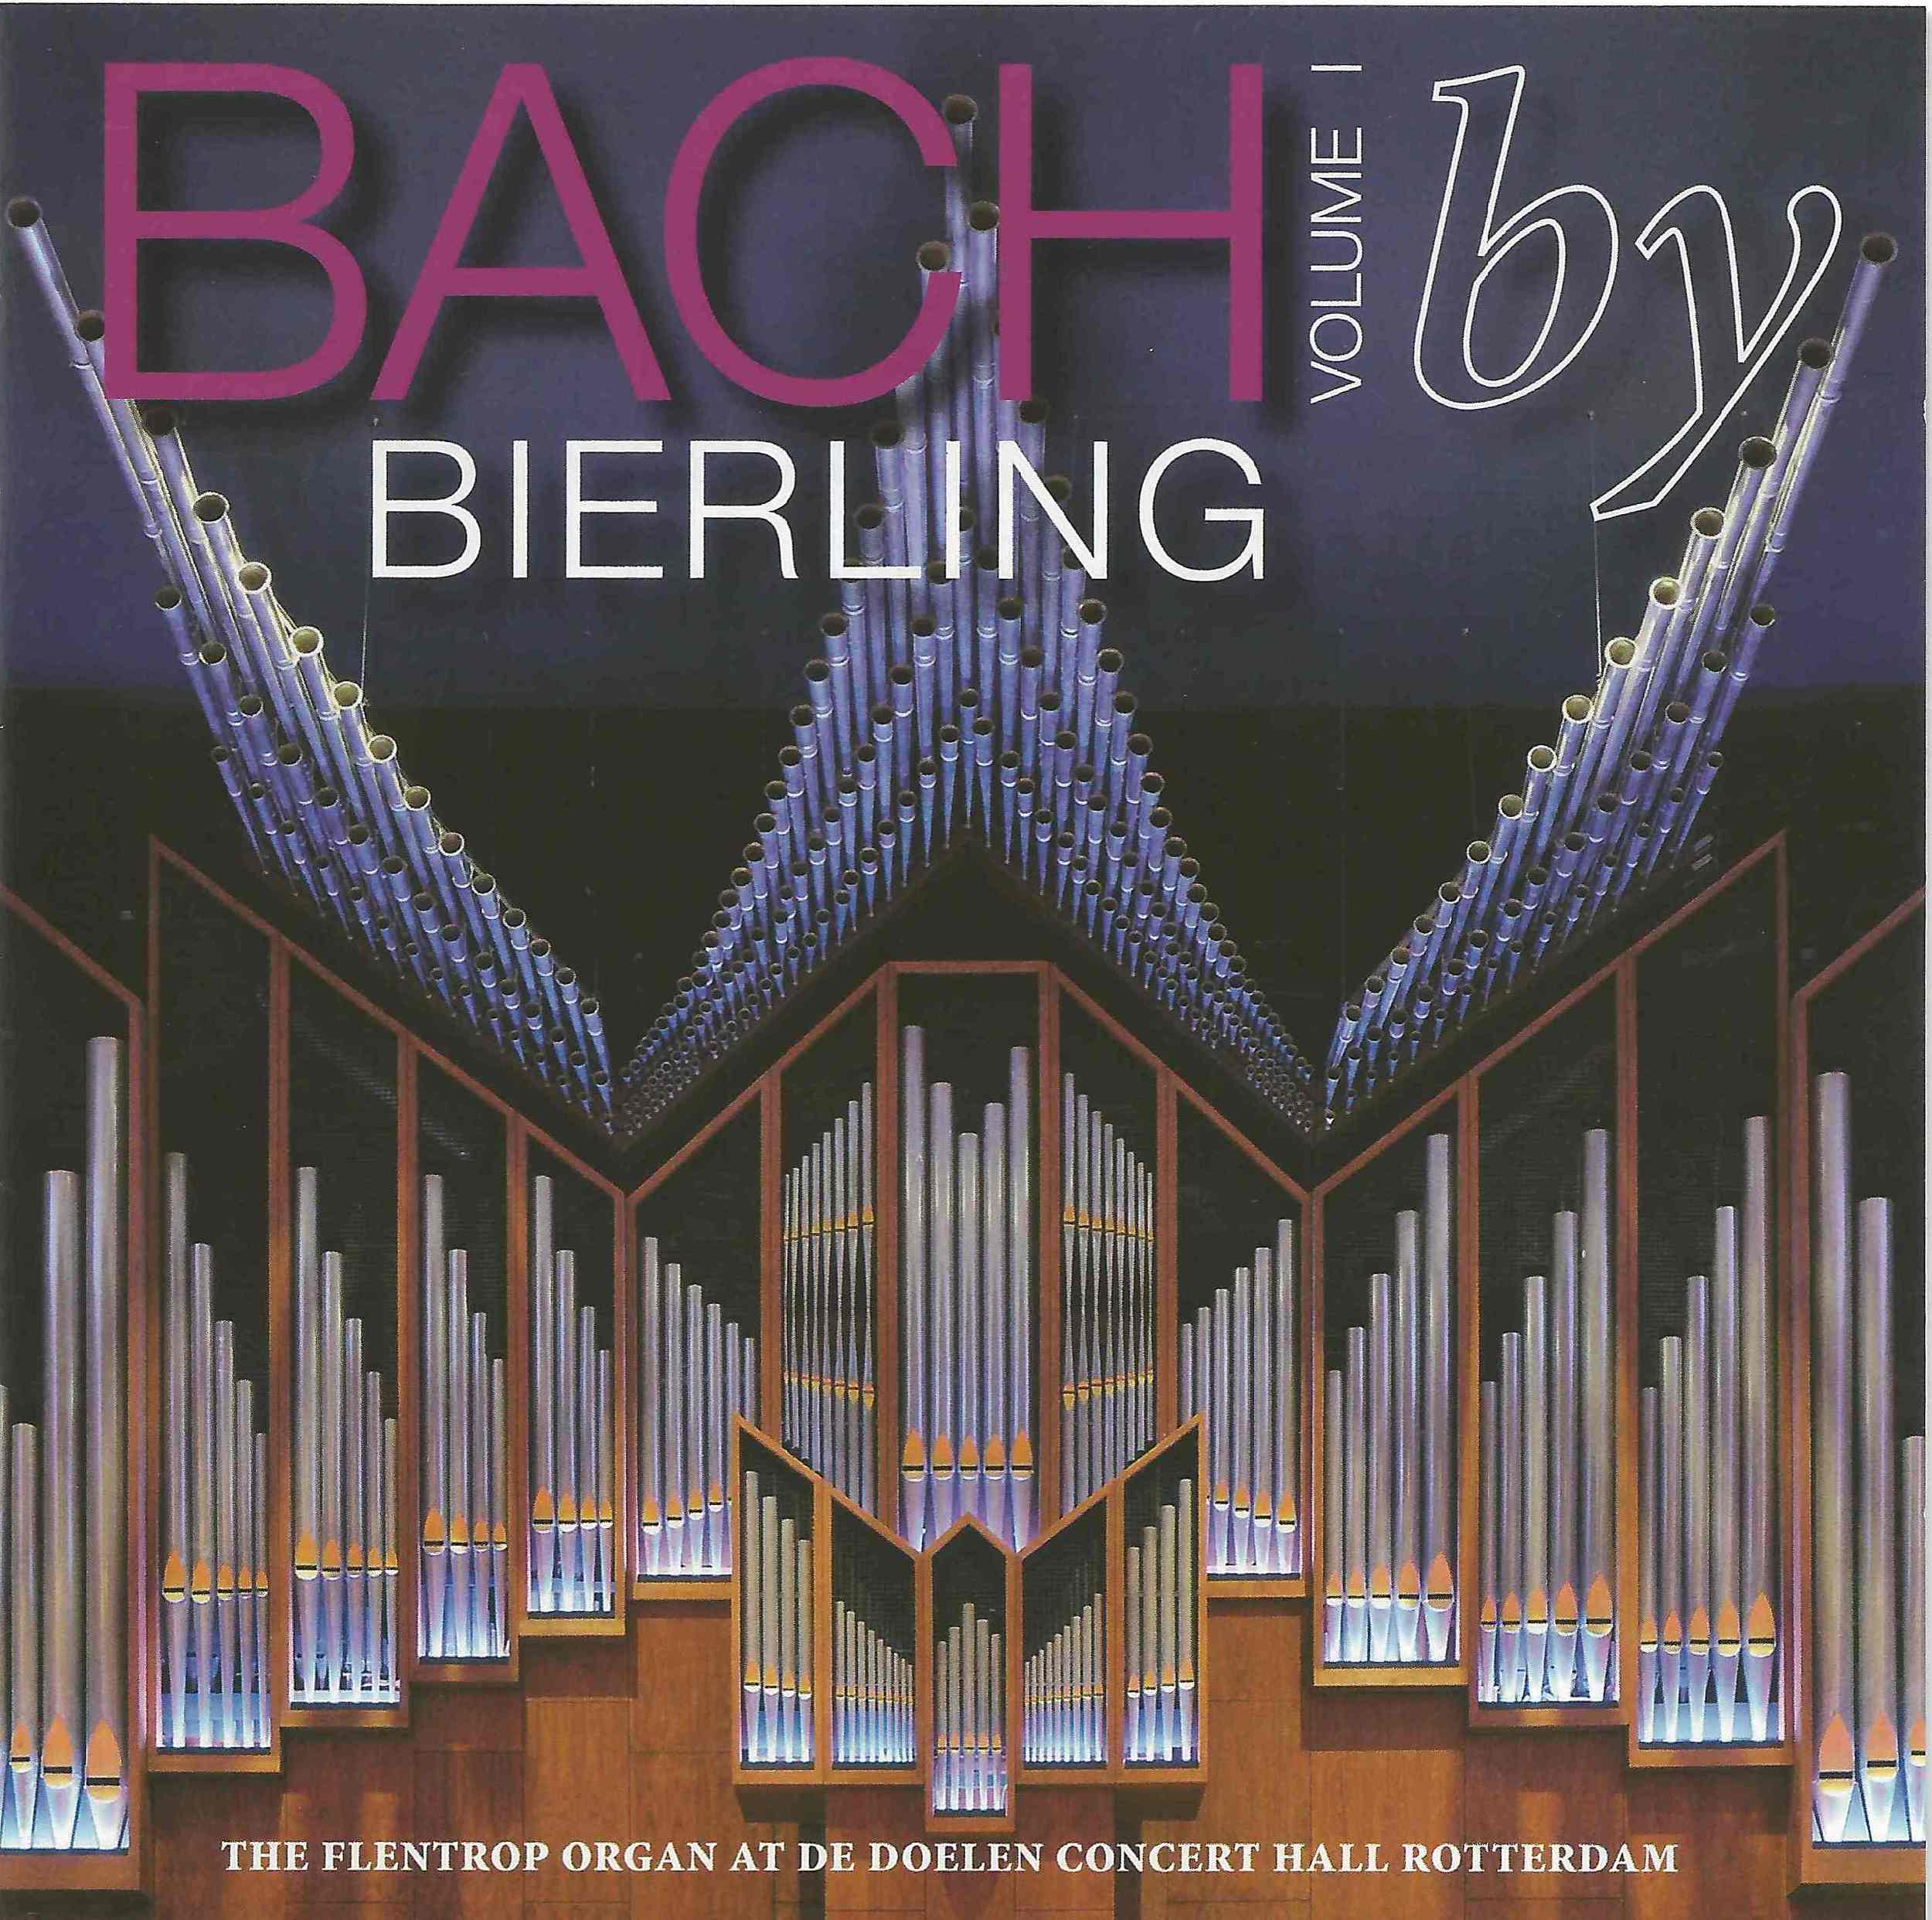 Bach By Bierling